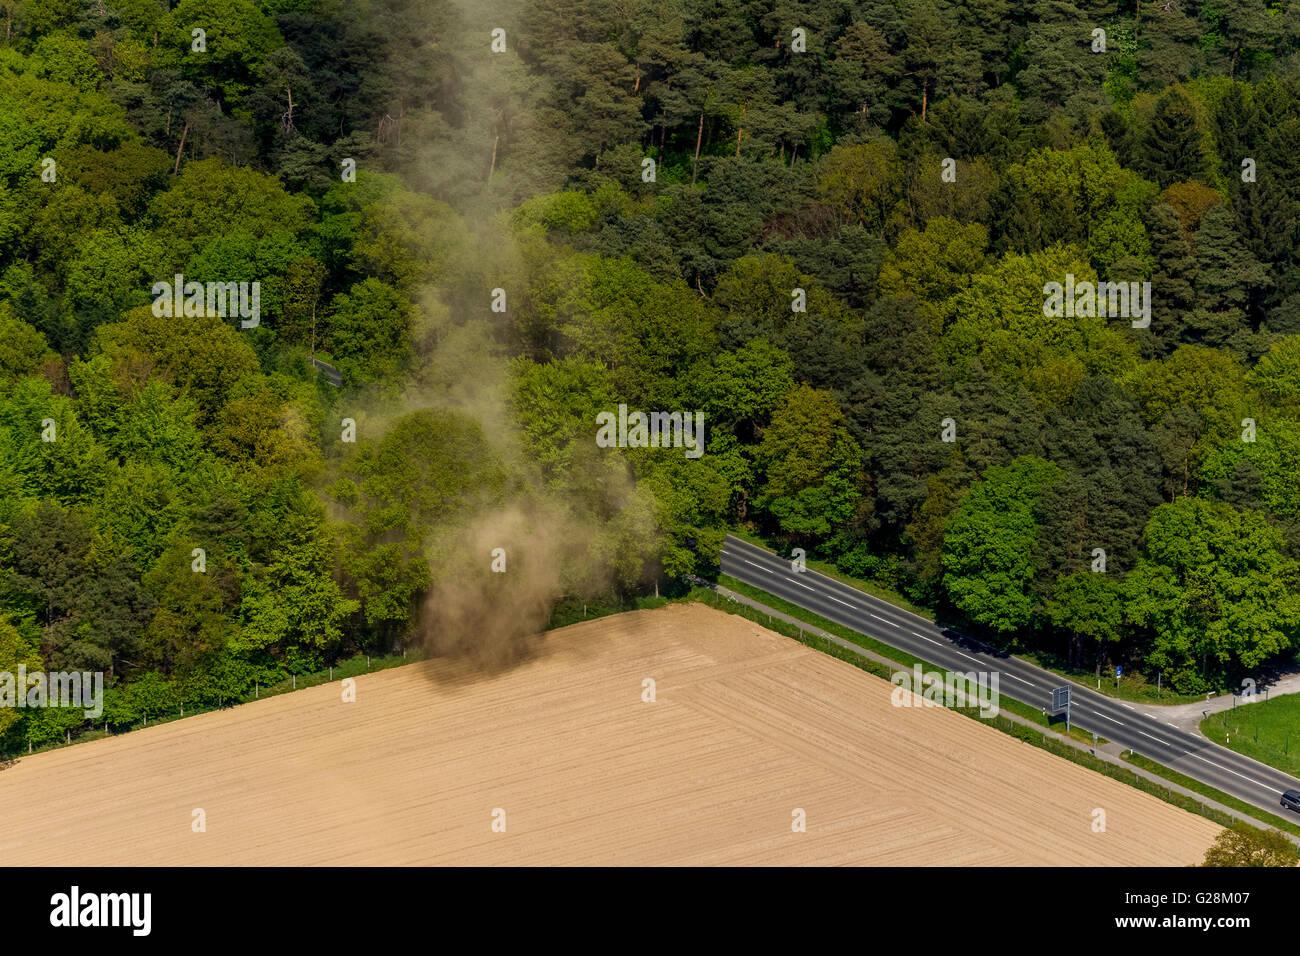 Aerial, aerial view, wind pants on a field near Mönchengladbach, small tornado, Mönchengladbach Niederrhein - Stock Image